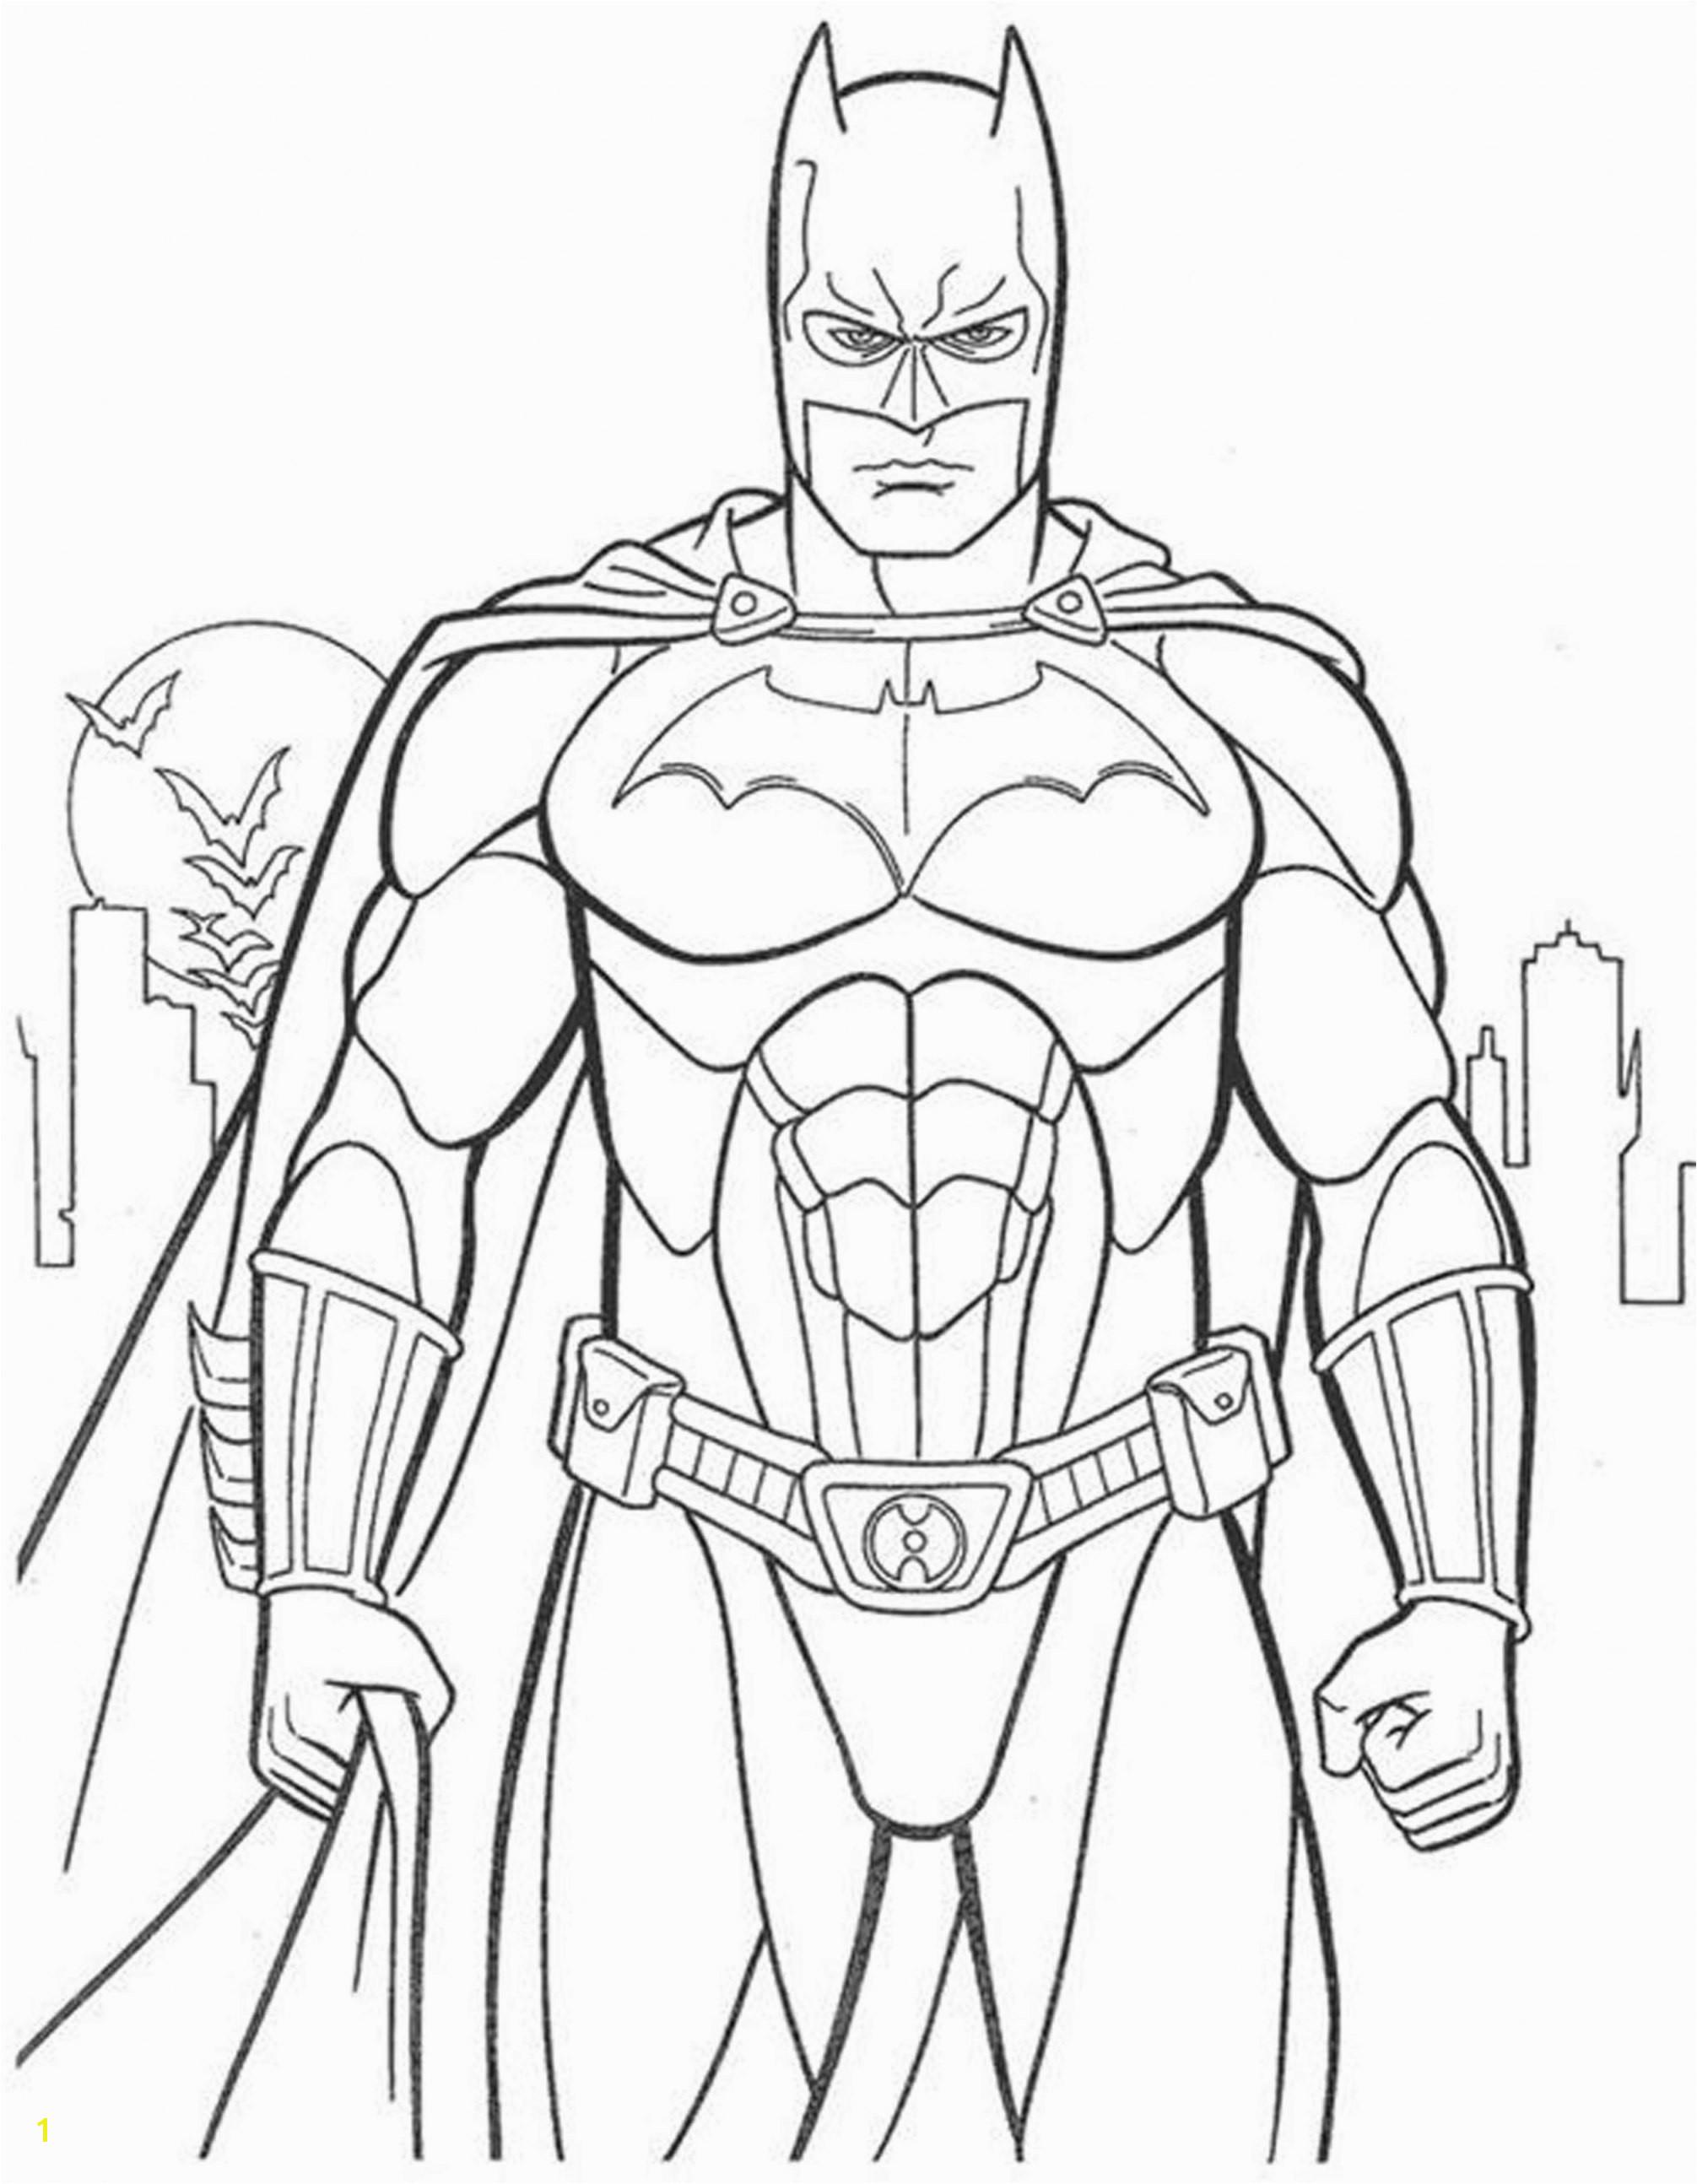 Free Coloring Pages Batman Fresh Free Batman Coloring Pages Luxury Coloring Printables 0d – Funbatman